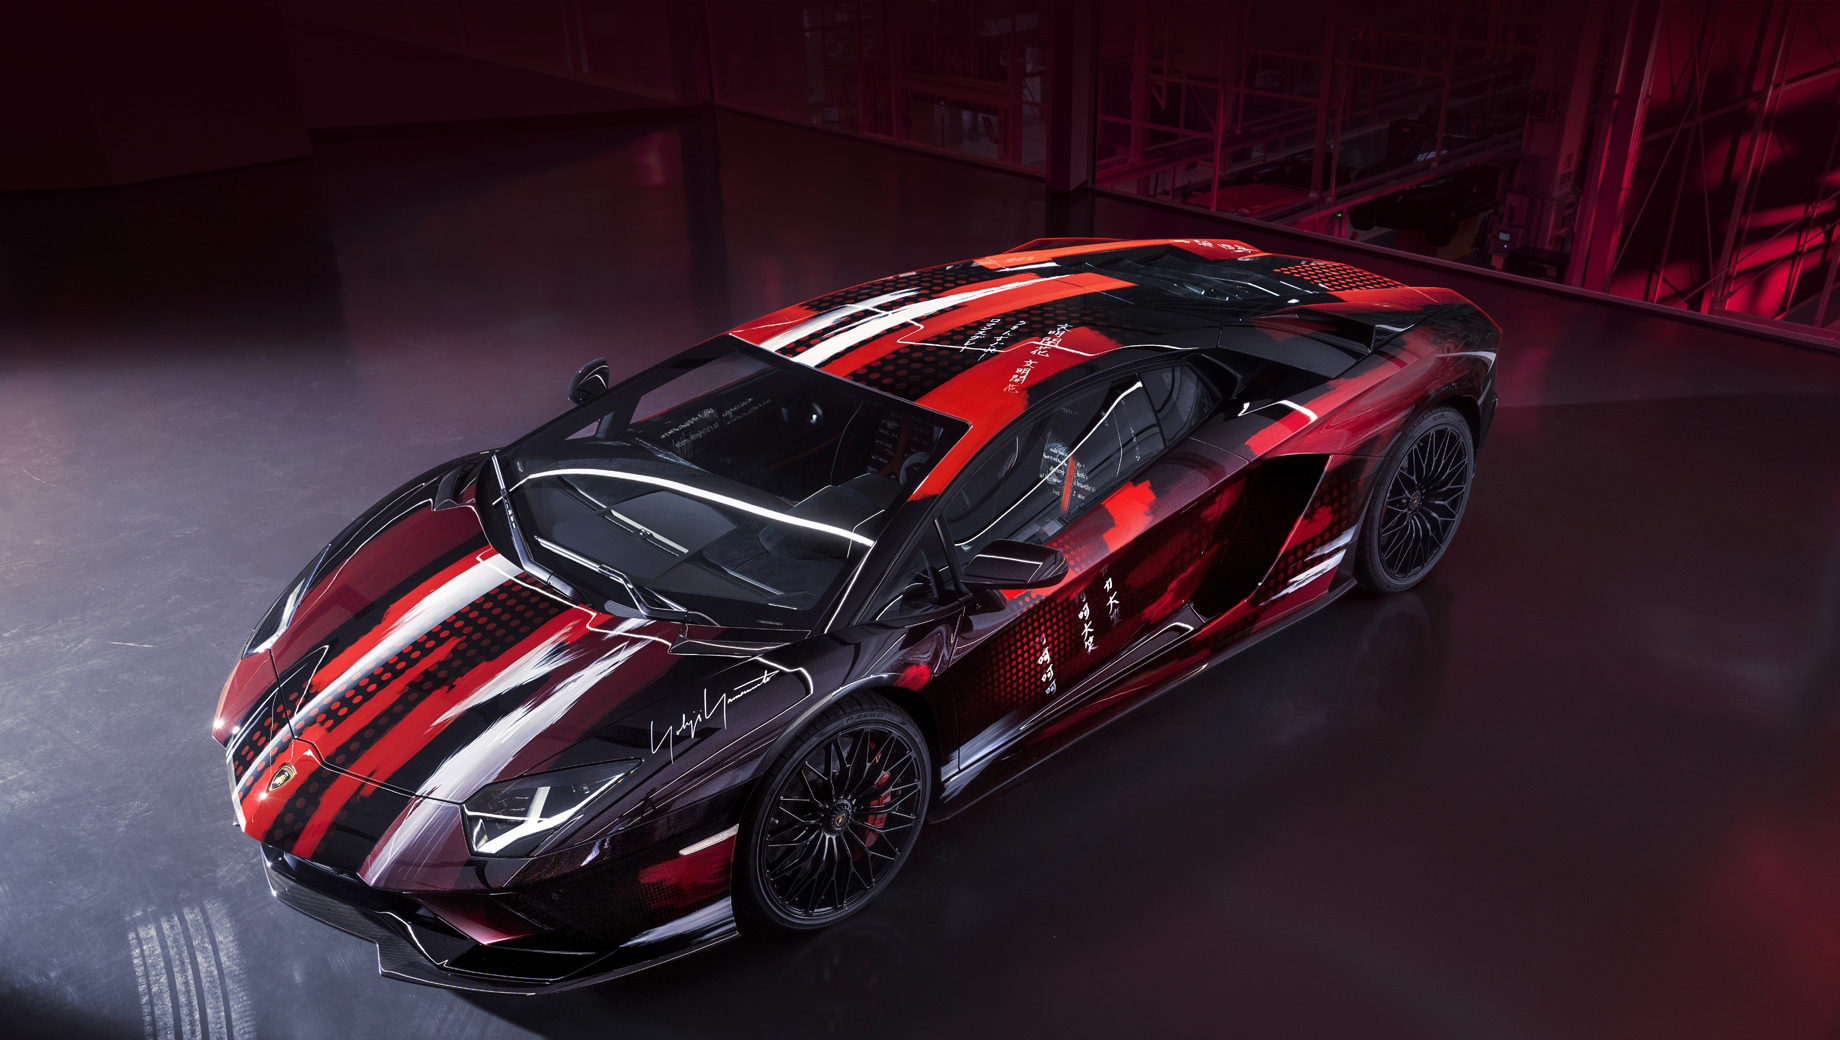 Lamborghini Aventador S Yamamoto украсил открытие новой студии